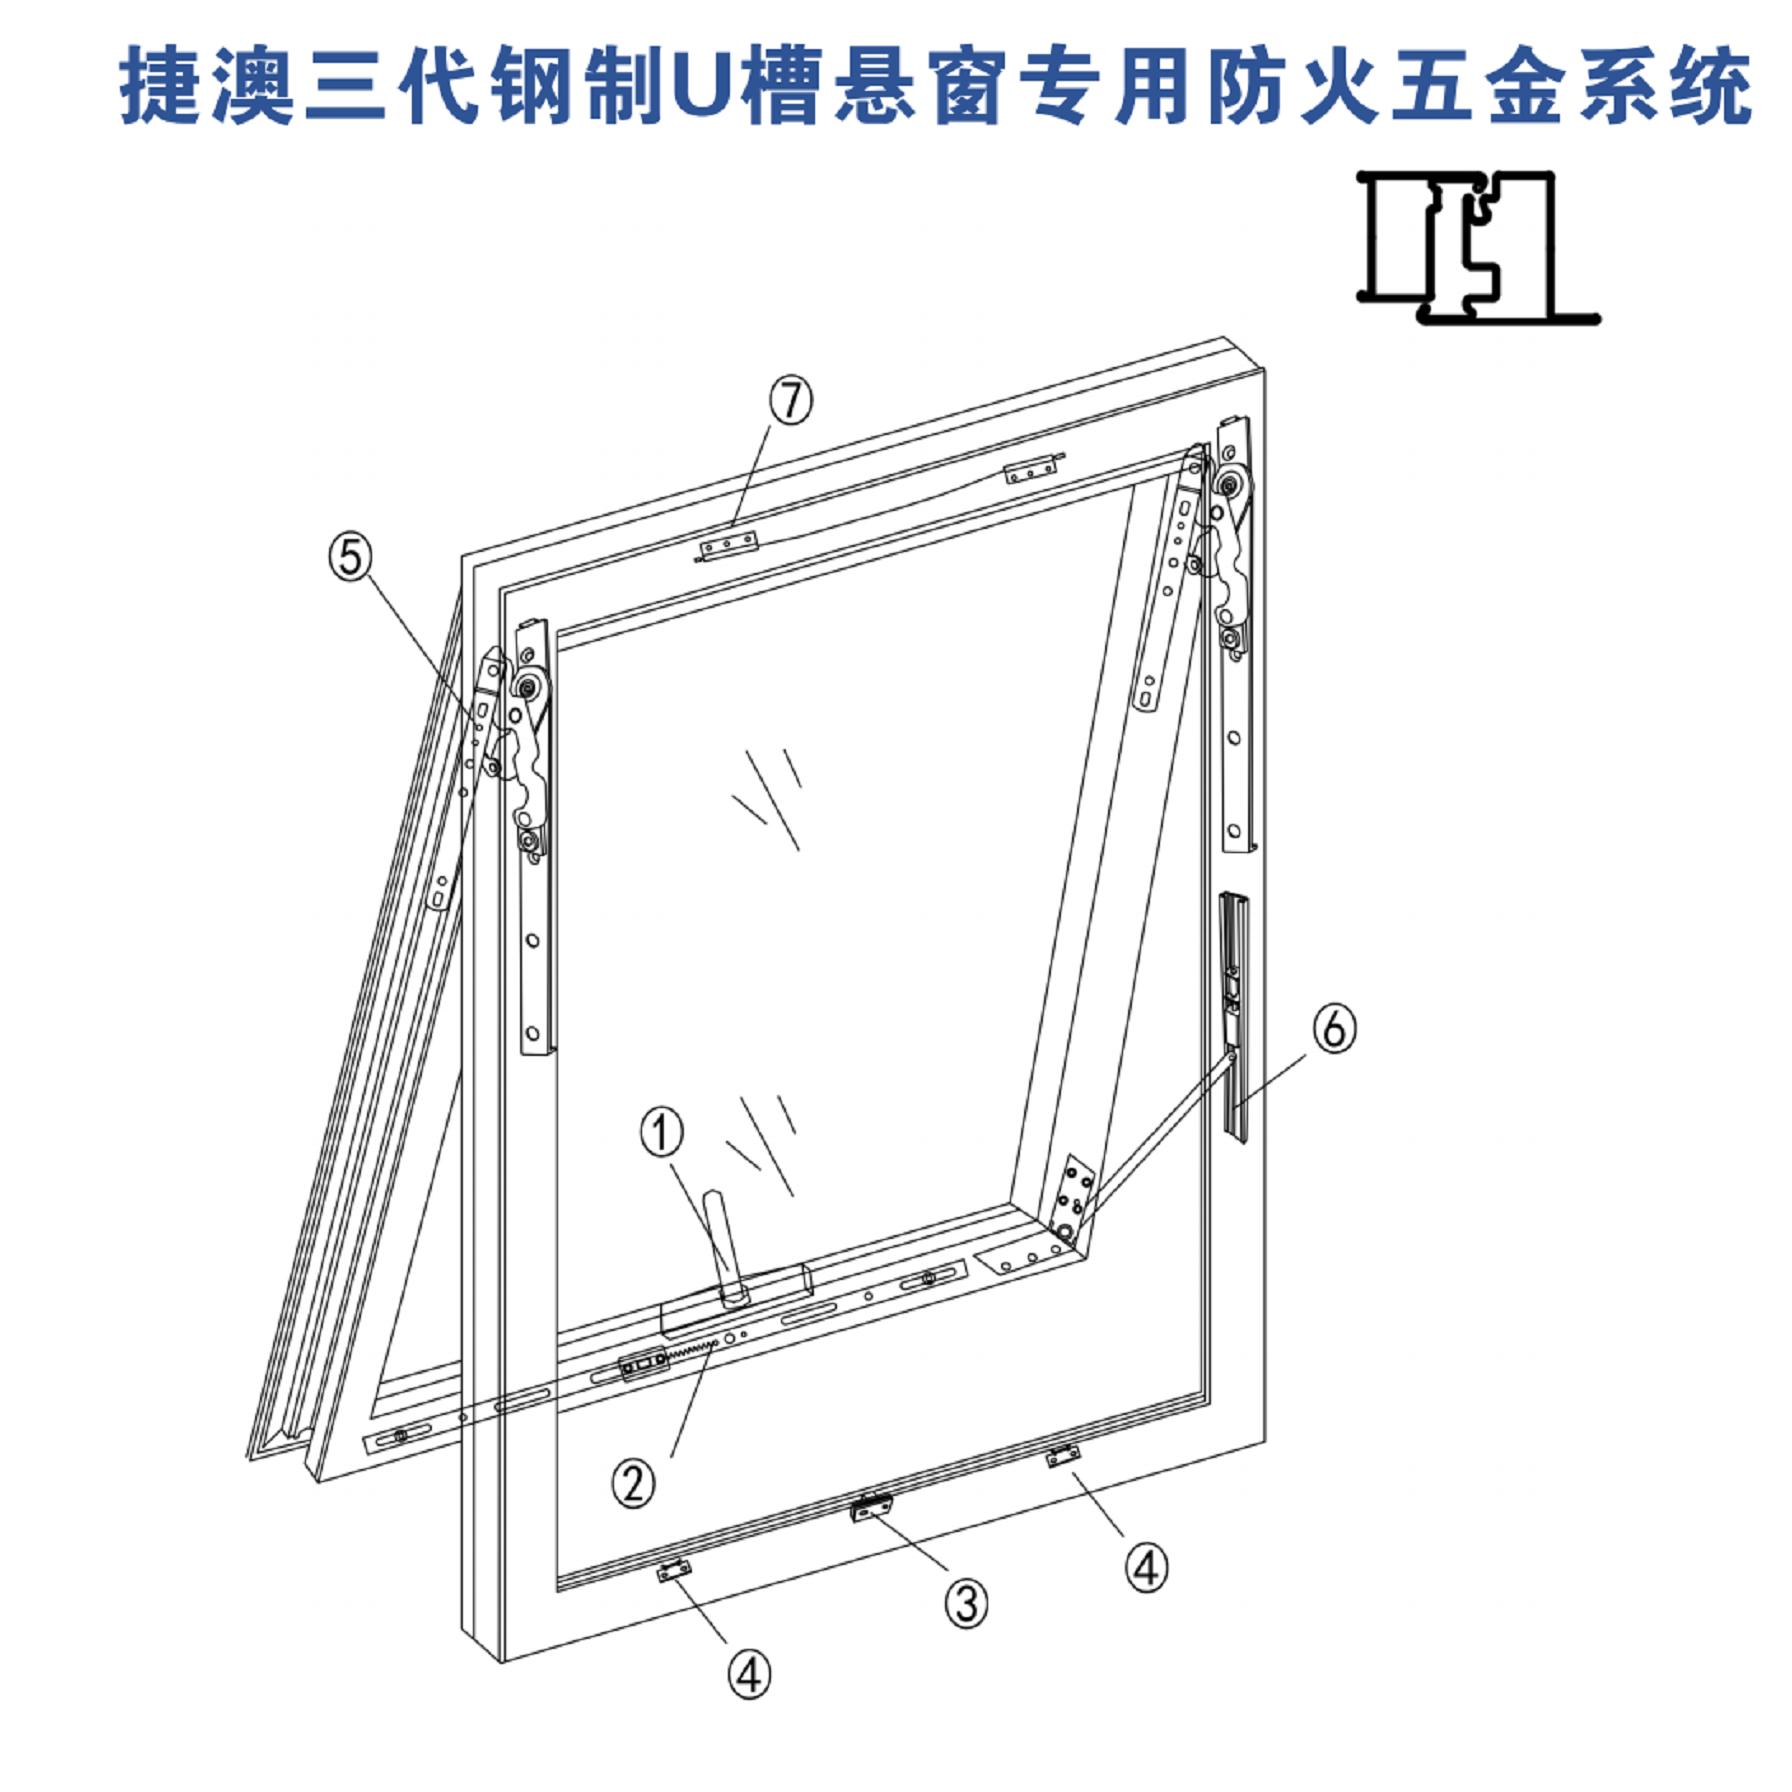 Special fireproof hardware system for Jieao steel U-slot hanging window